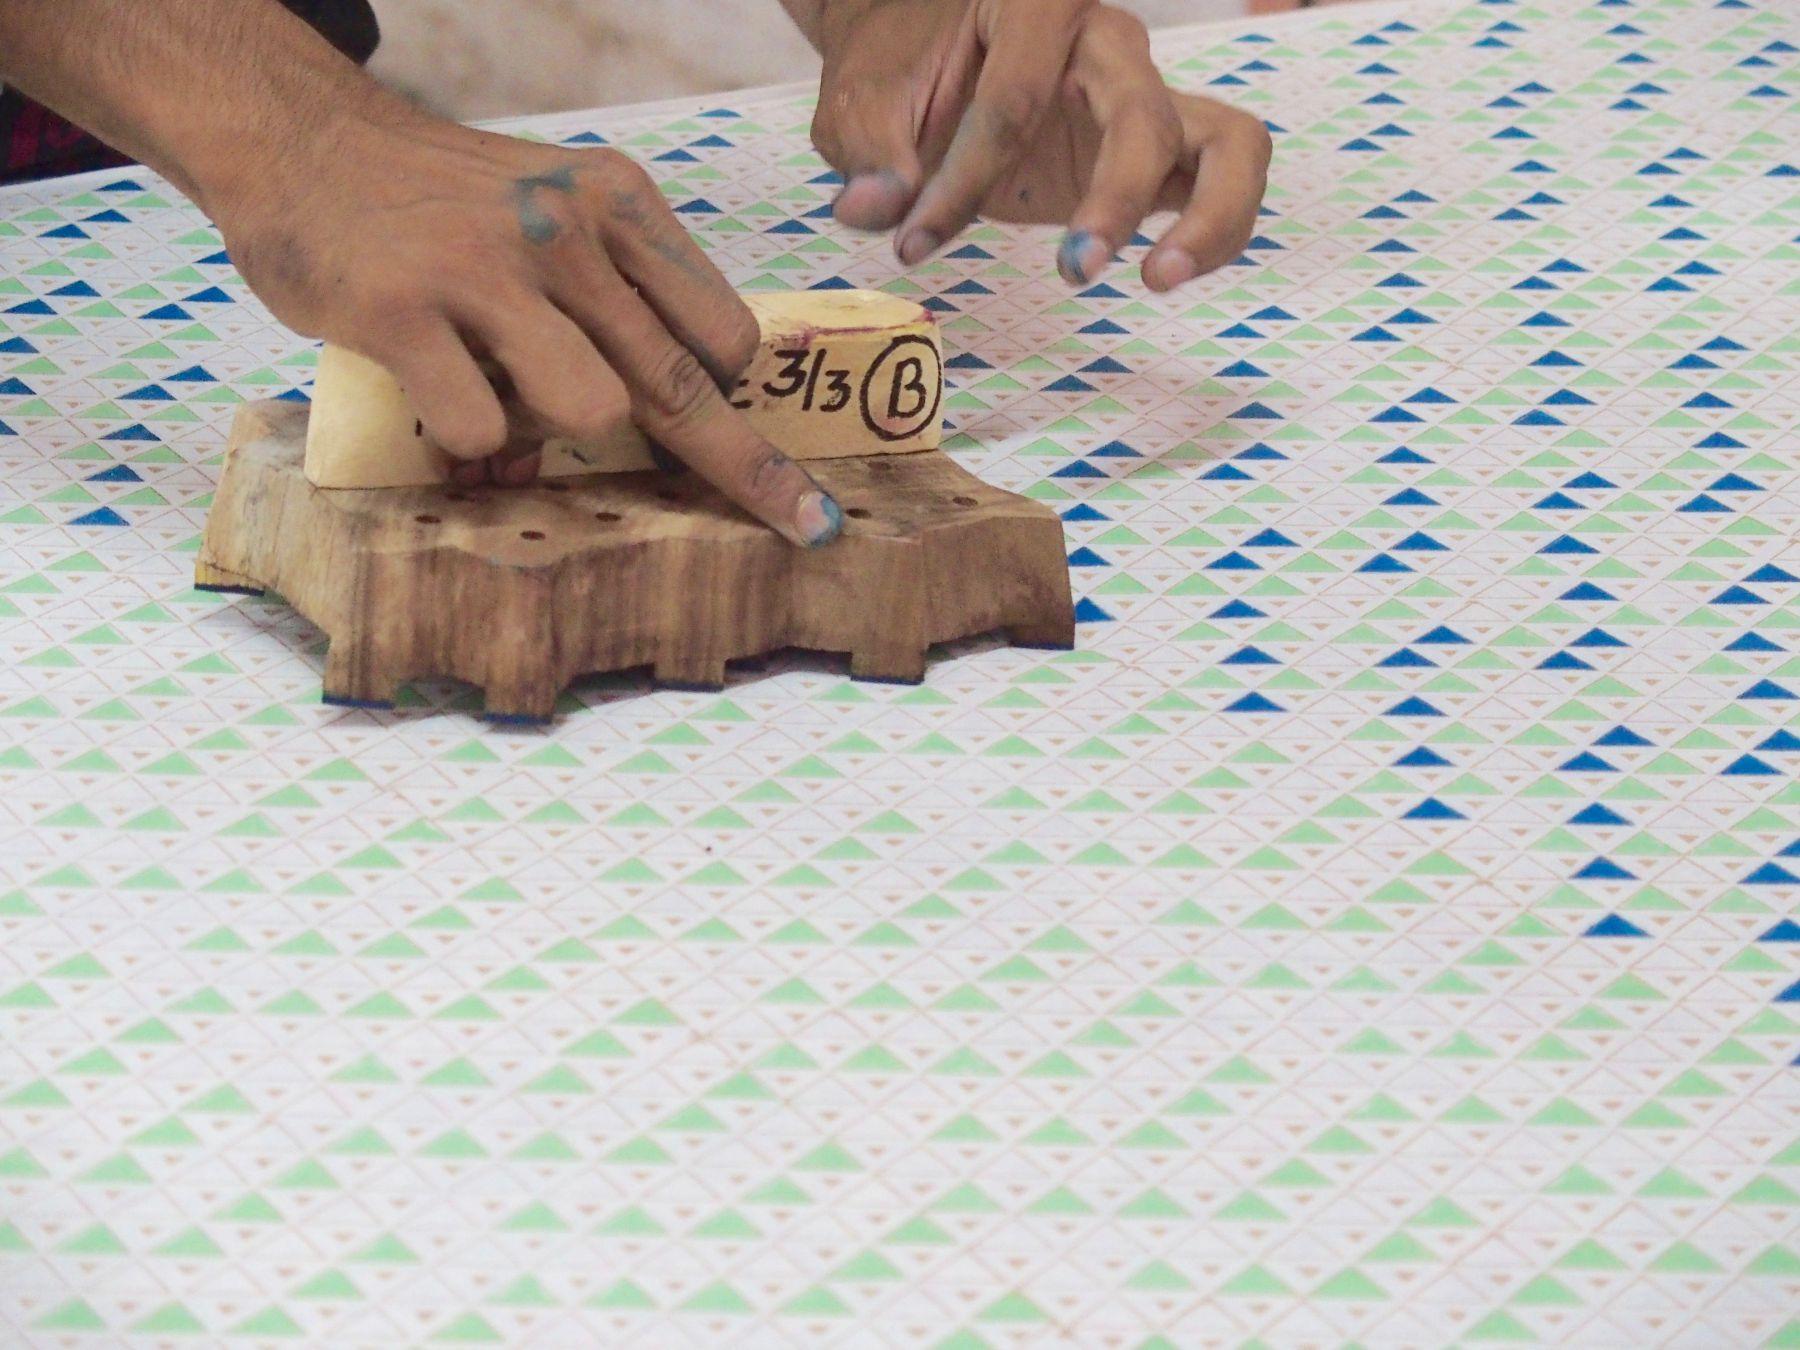 impression tissus inde blockprint bindi atelier